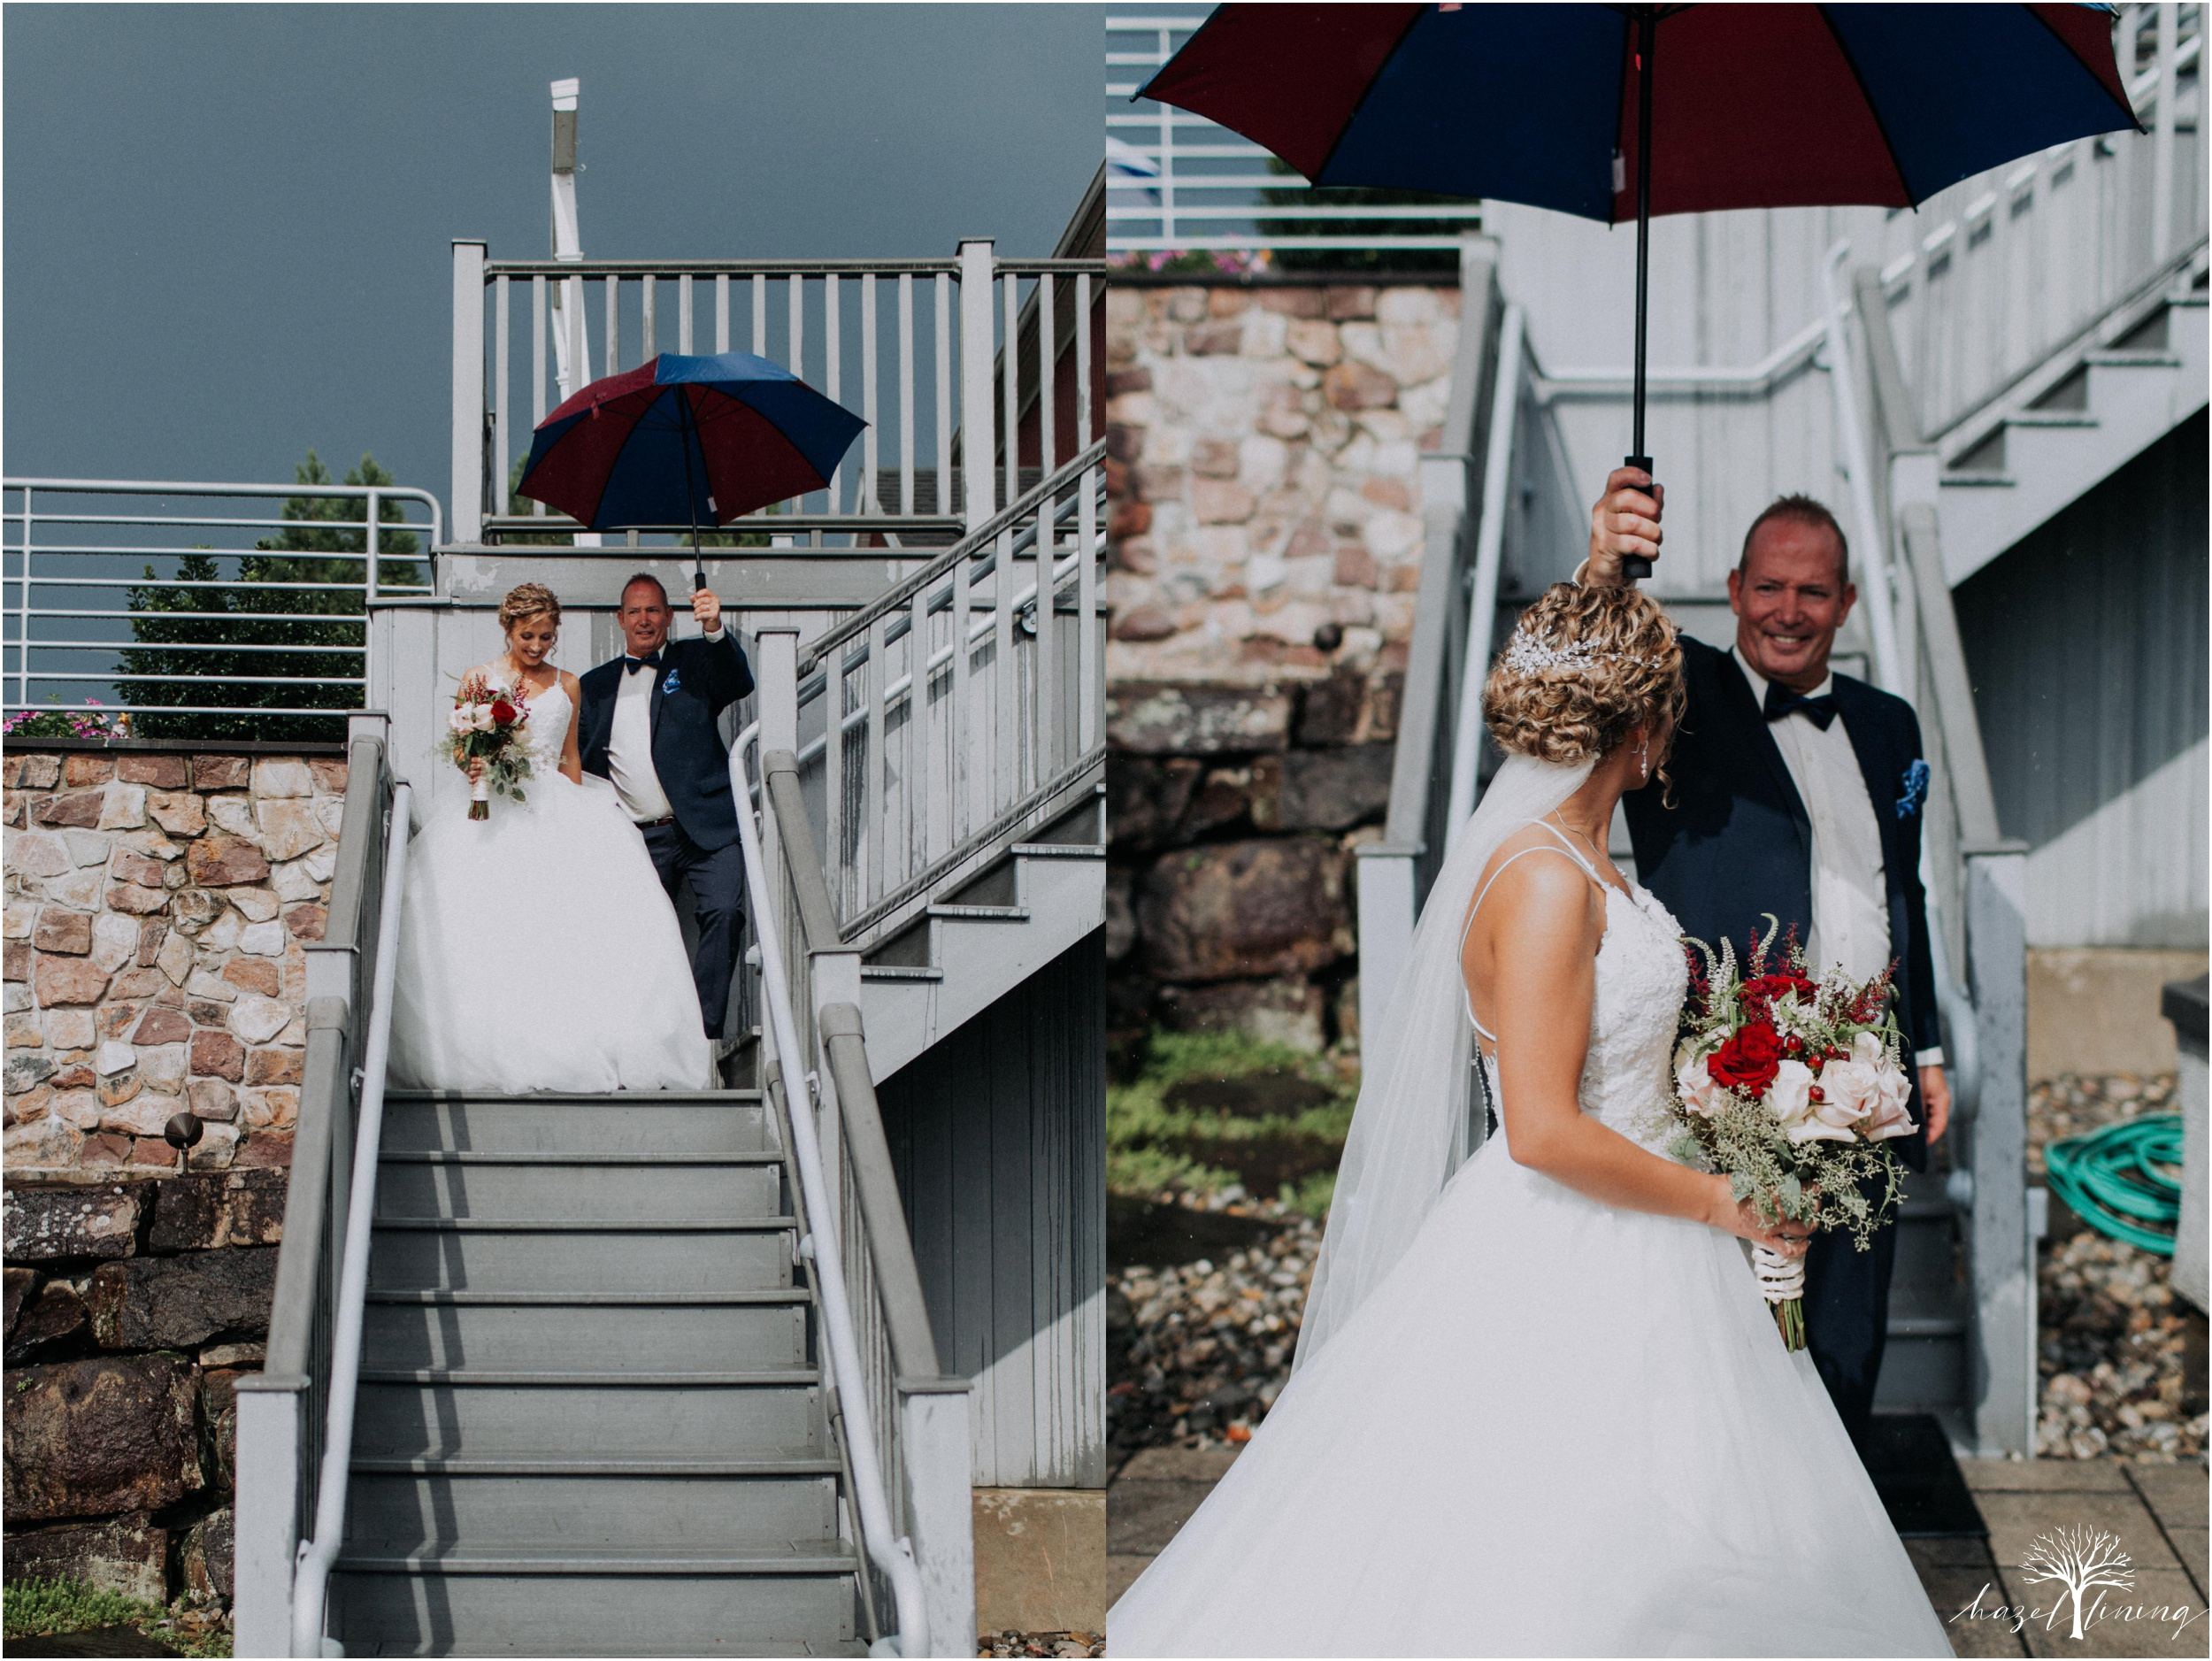 jonathan-weibel-becky-haywood-loft-at-sweetwater-cc-pennsburg-pennsylvania-rainy-day-summer-wedding-hazel-lining-travel-wedding-elopement-photography_0040.jpg